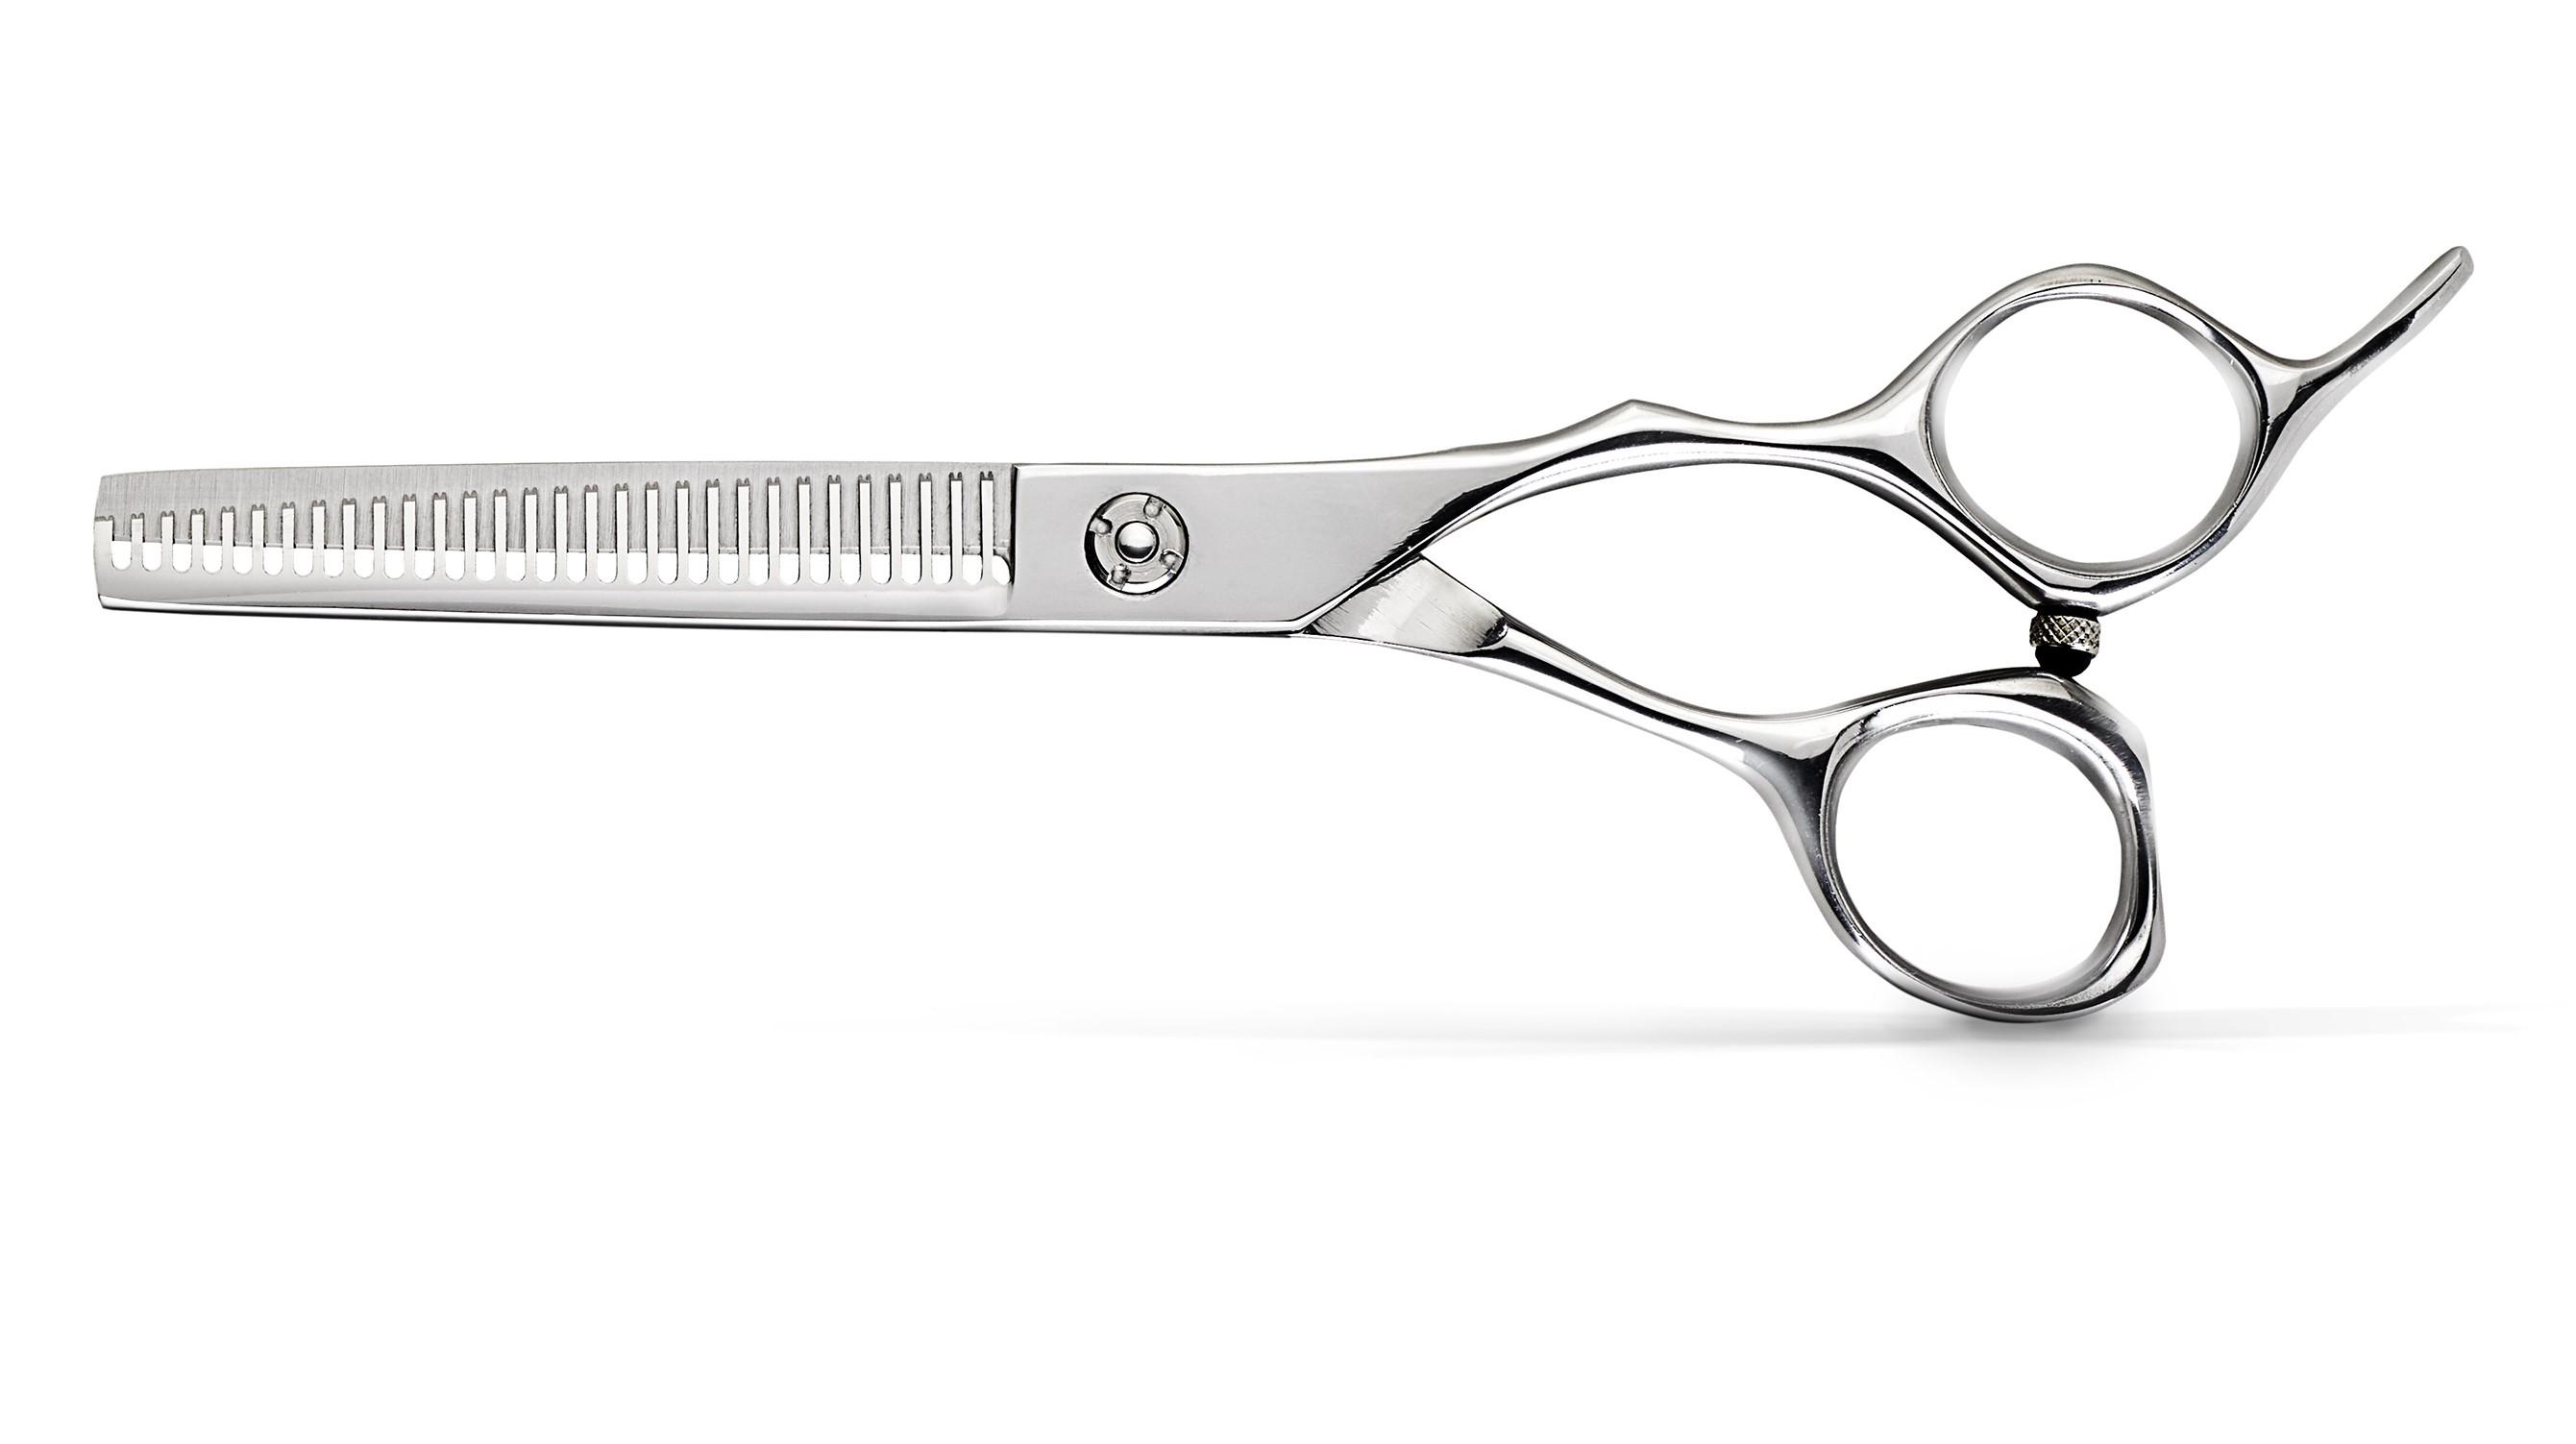 Kiepe Blending Scissors 30 Teeth Semi-Offset 2898T30 - profesionální efilační nůžky